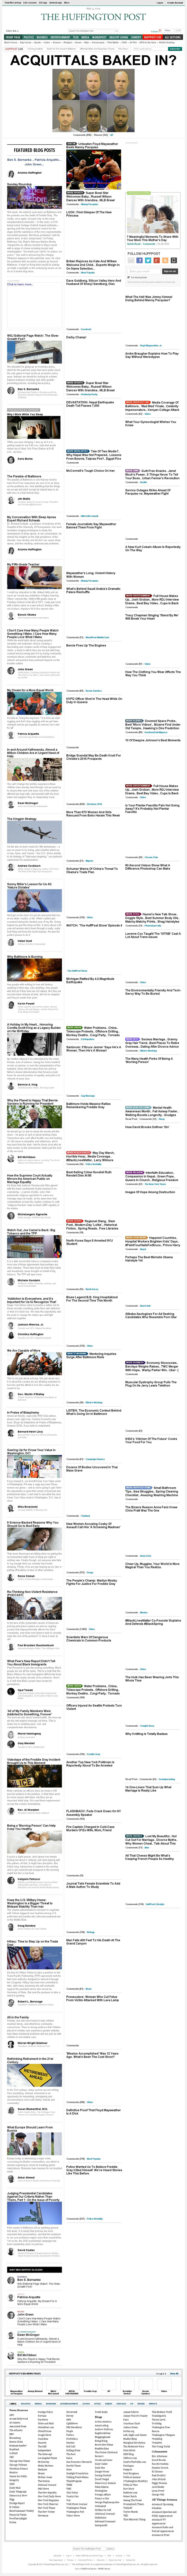 The Huffington Post at Sunday May 3, 2015, 5:08 a.m. UTC